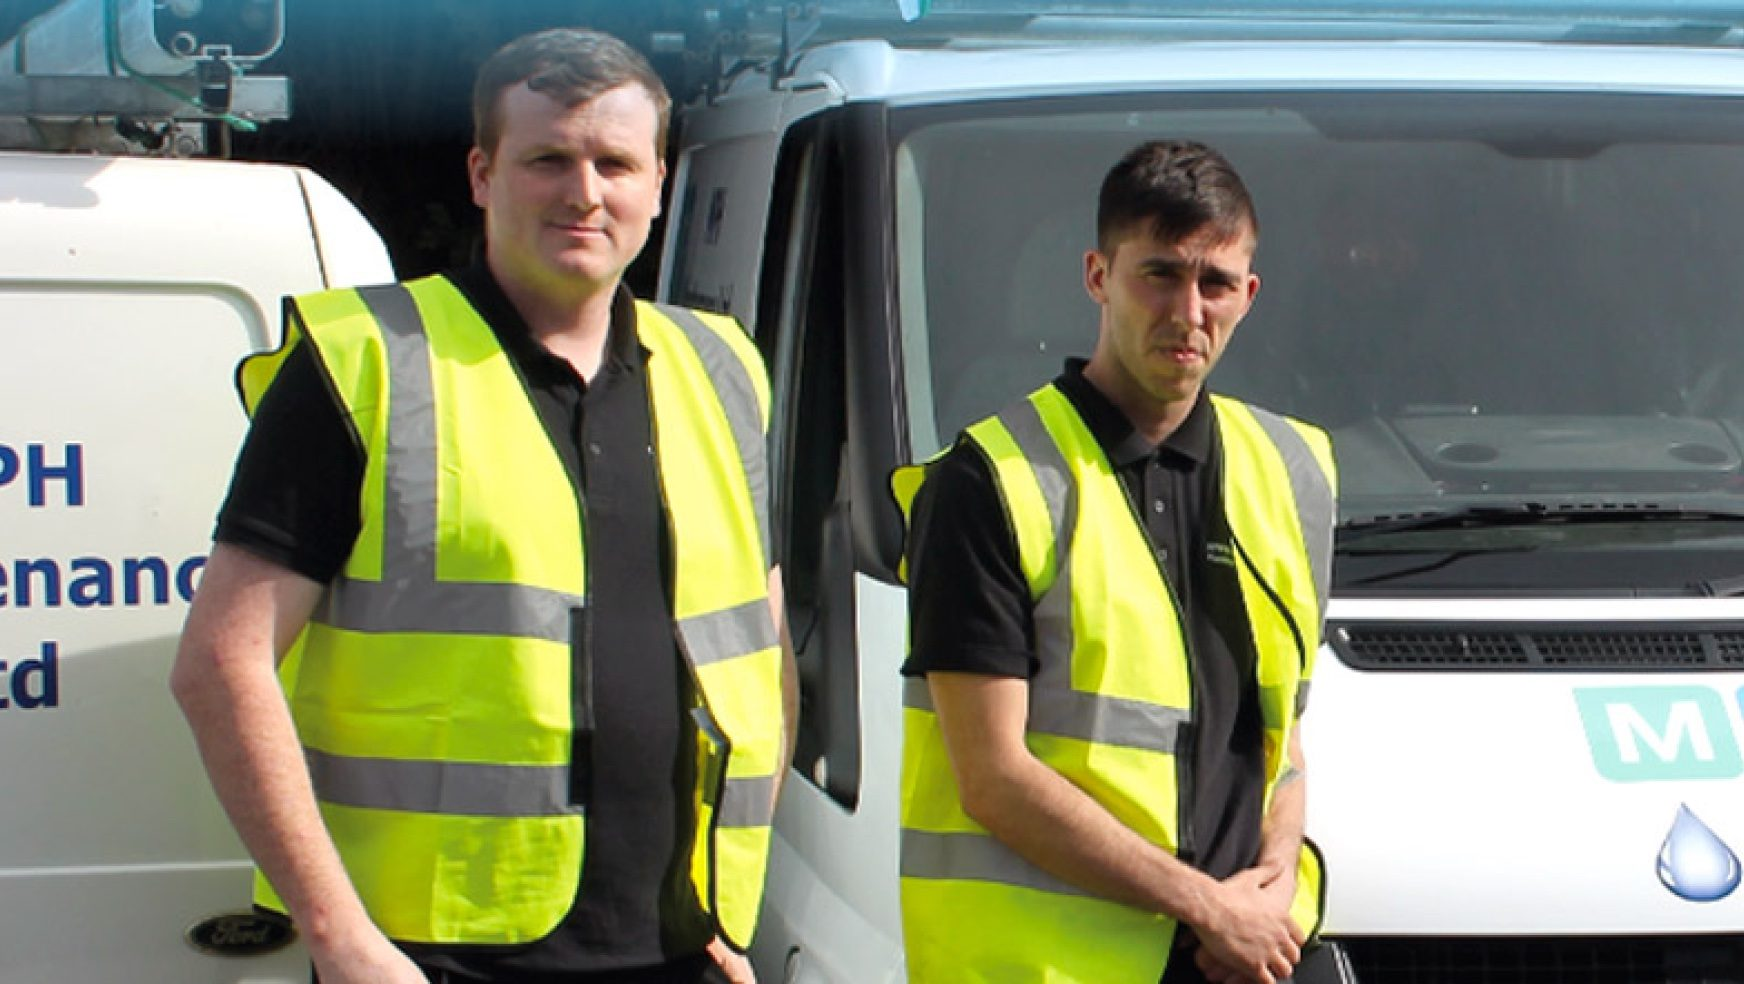 MPH Drain Services Ltd